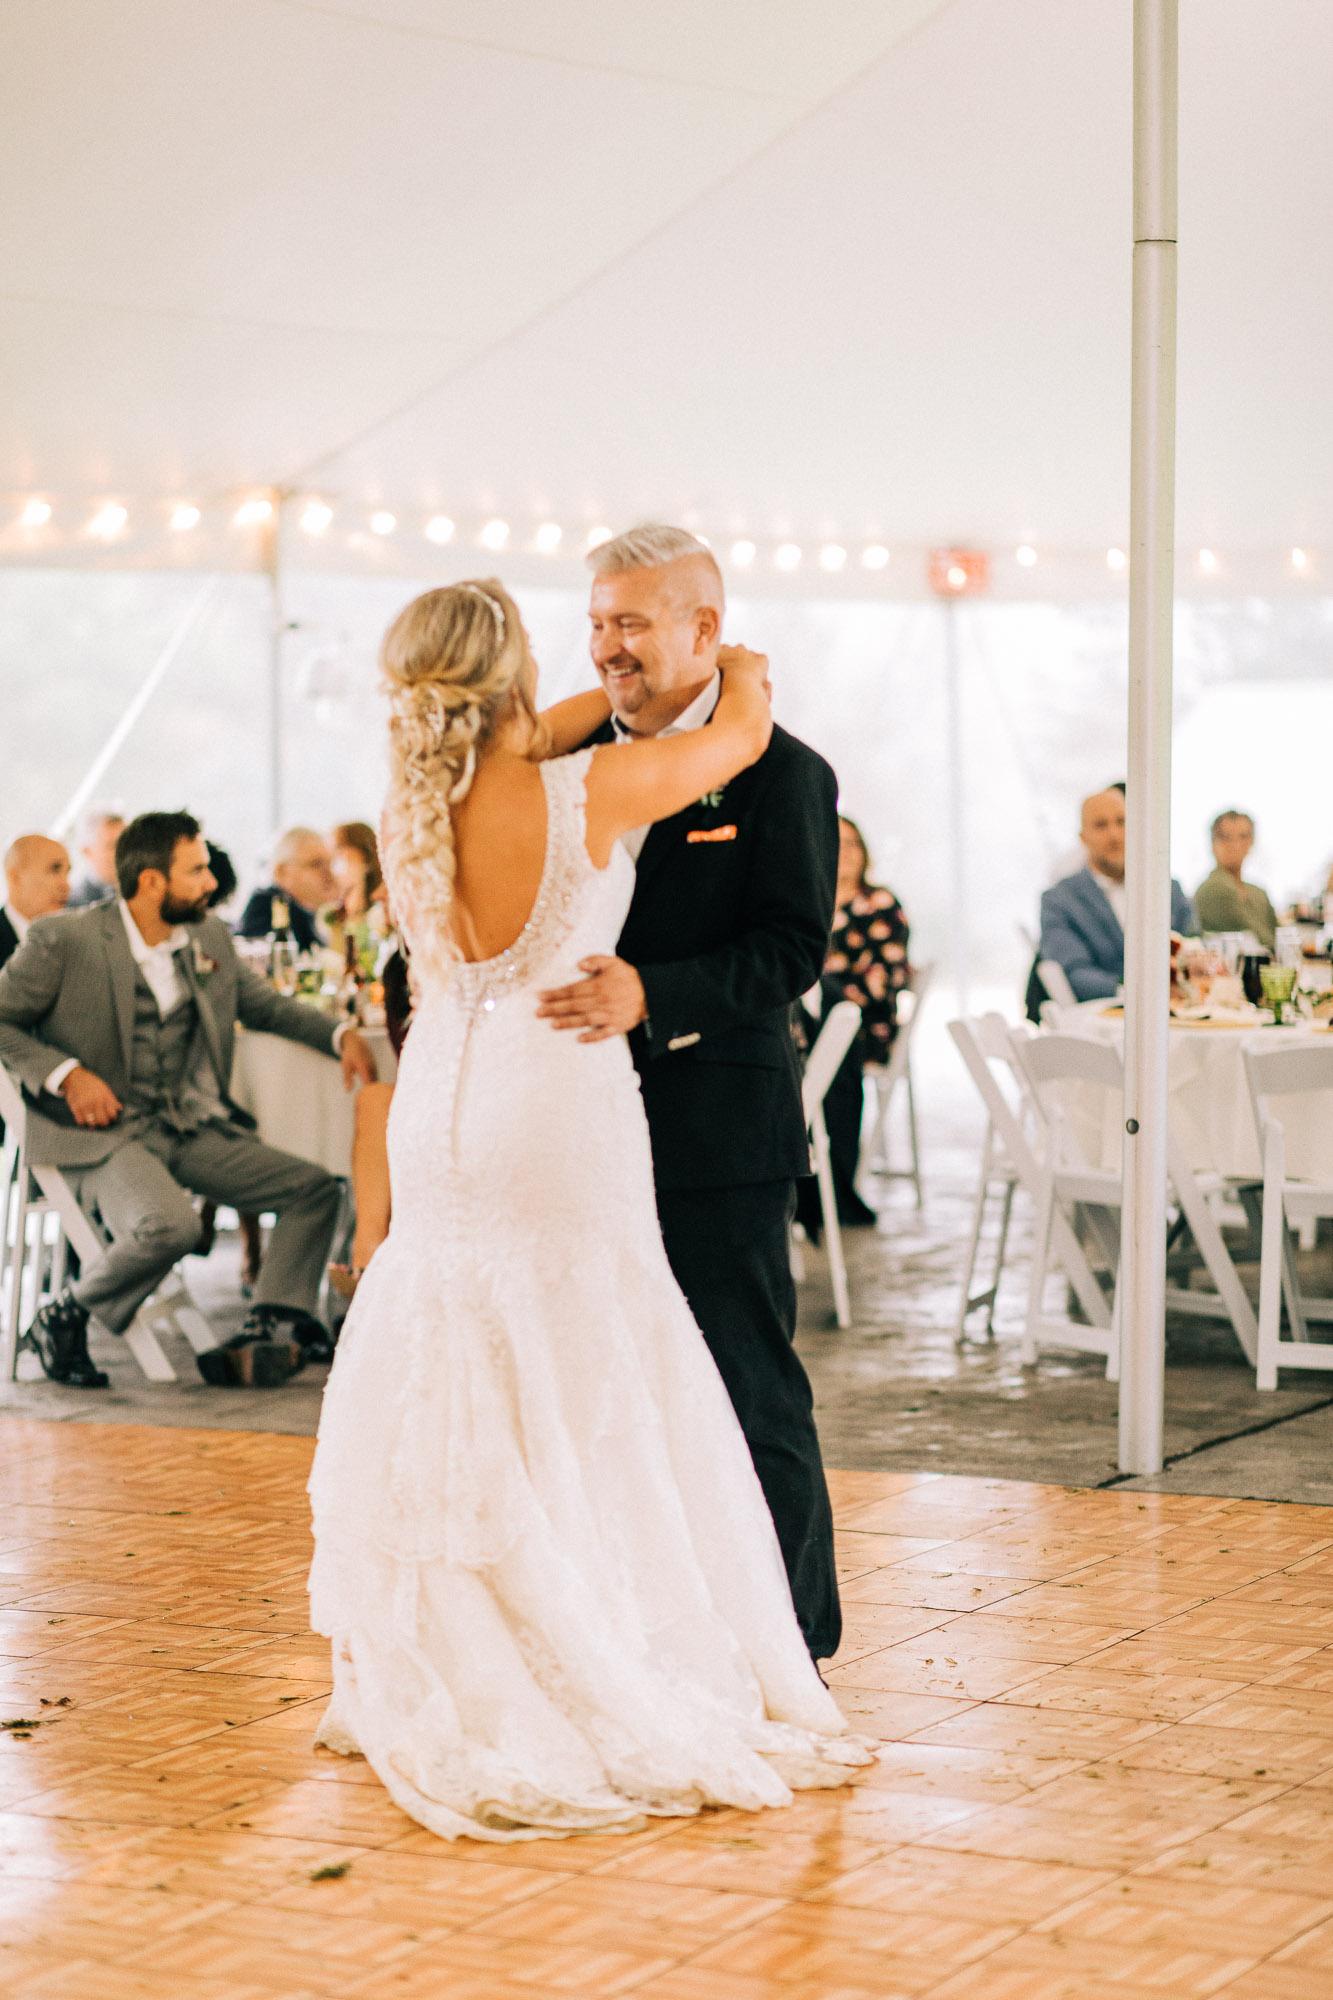 Lodge-at-Raven-Creek-October-wedding-69.jpg